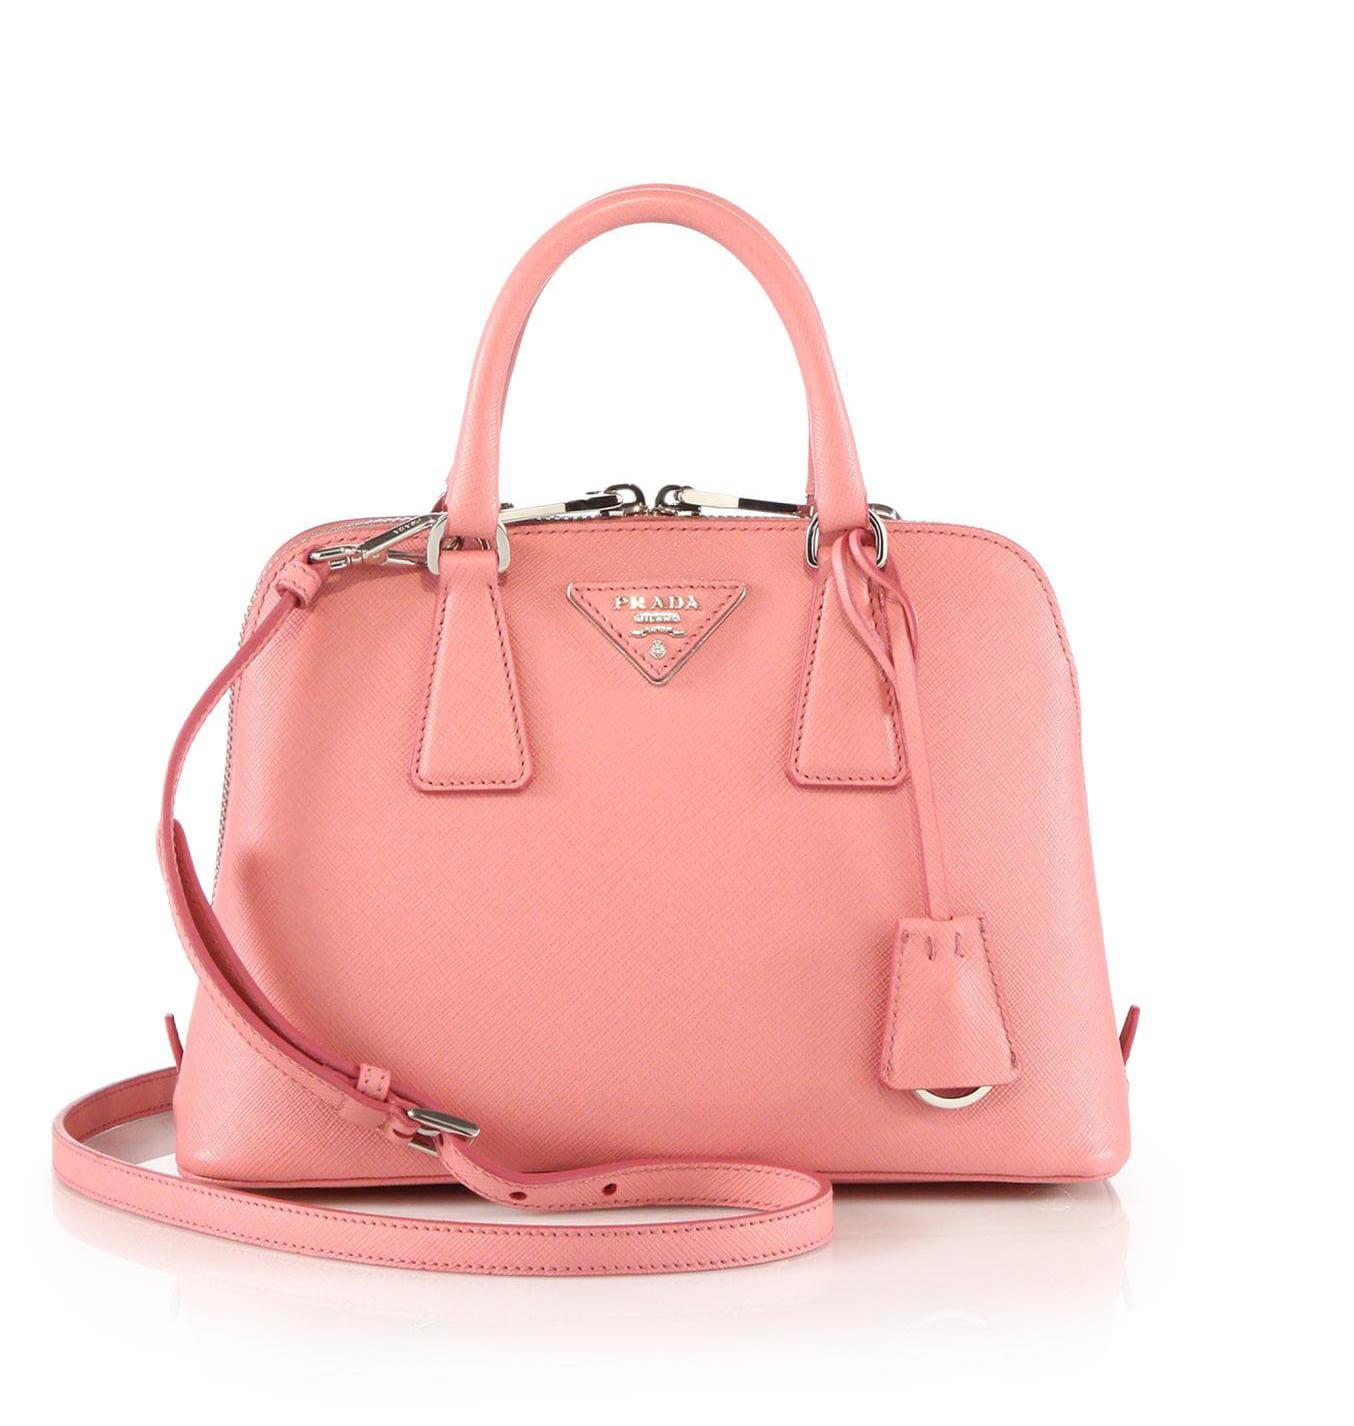 prada-petalo-mini-saffiano-leather-shoulder-bag-pink-product-0-550573713-normal